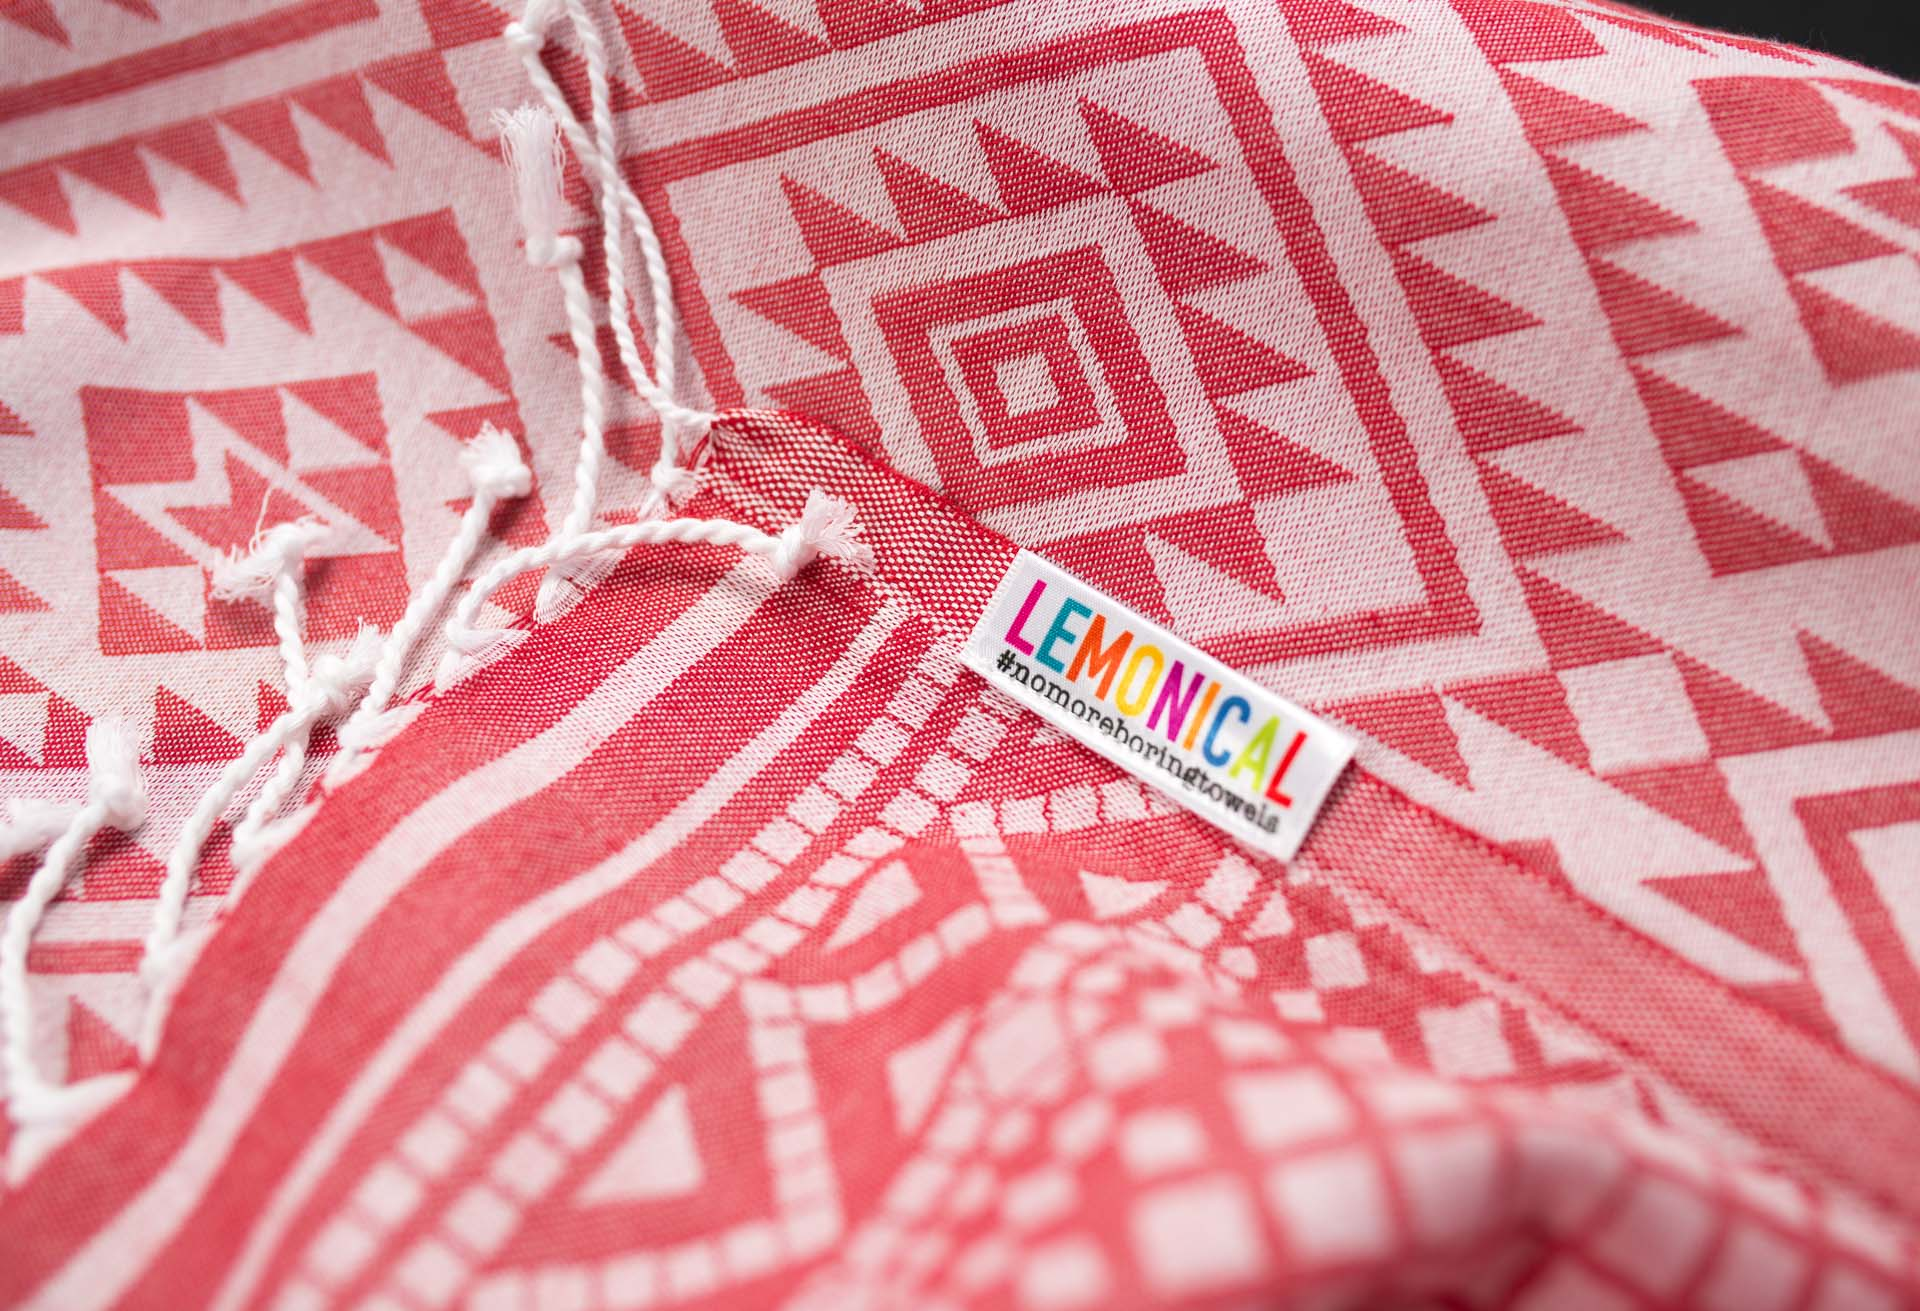 RED-ORIENT-Towel-Lemonical-3